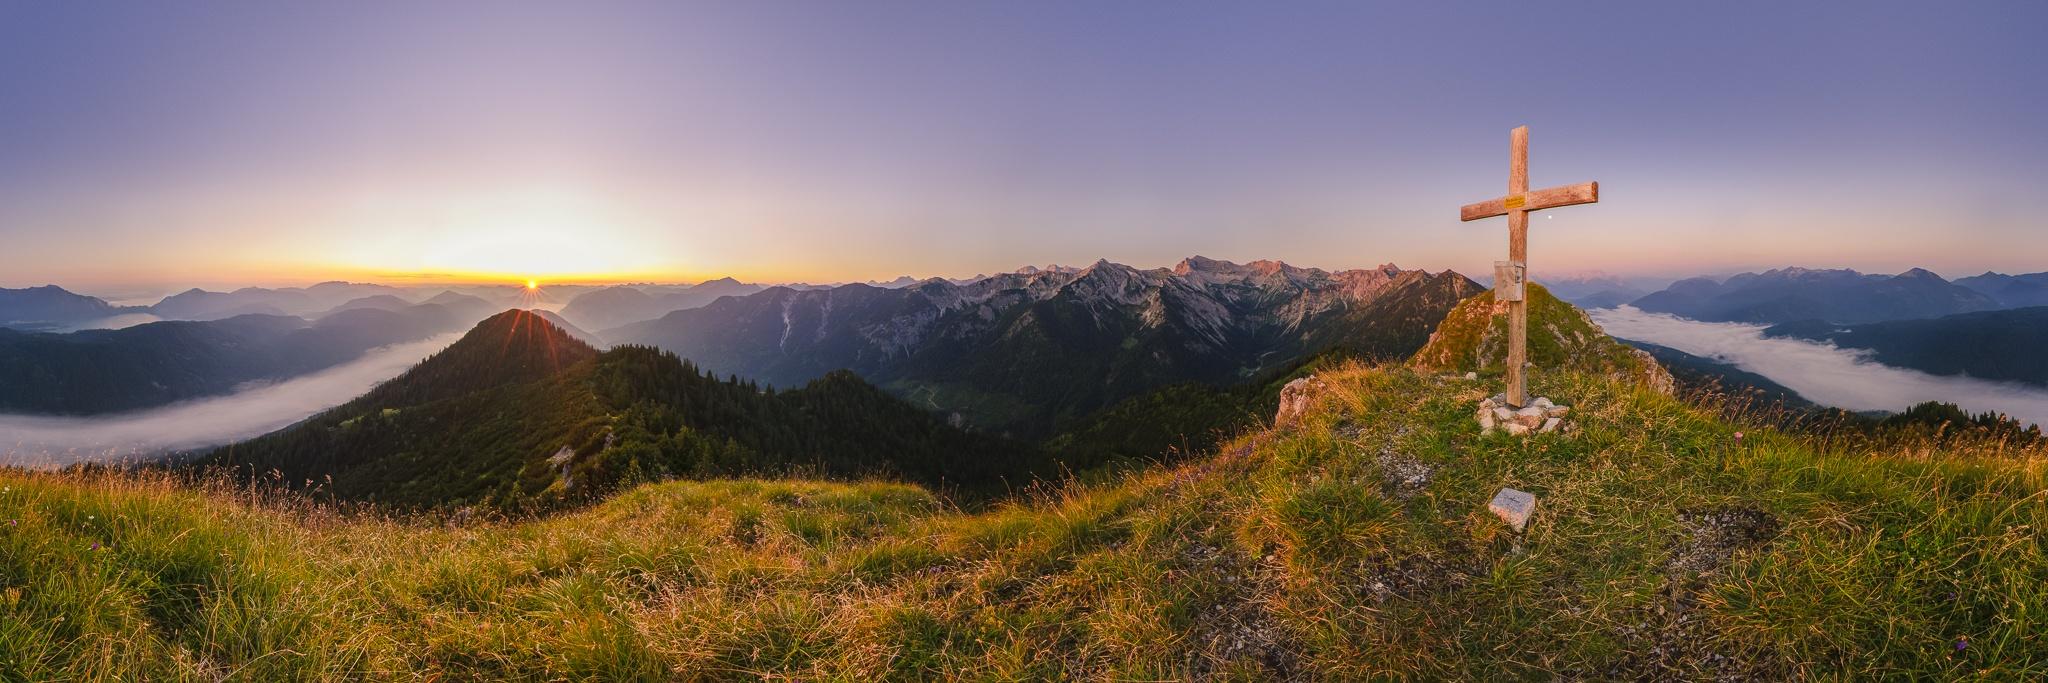 Soierngruppe, Hoher Grasberg, Panoramablick, Bergpanorama, Bayern, Karwendelgebirge